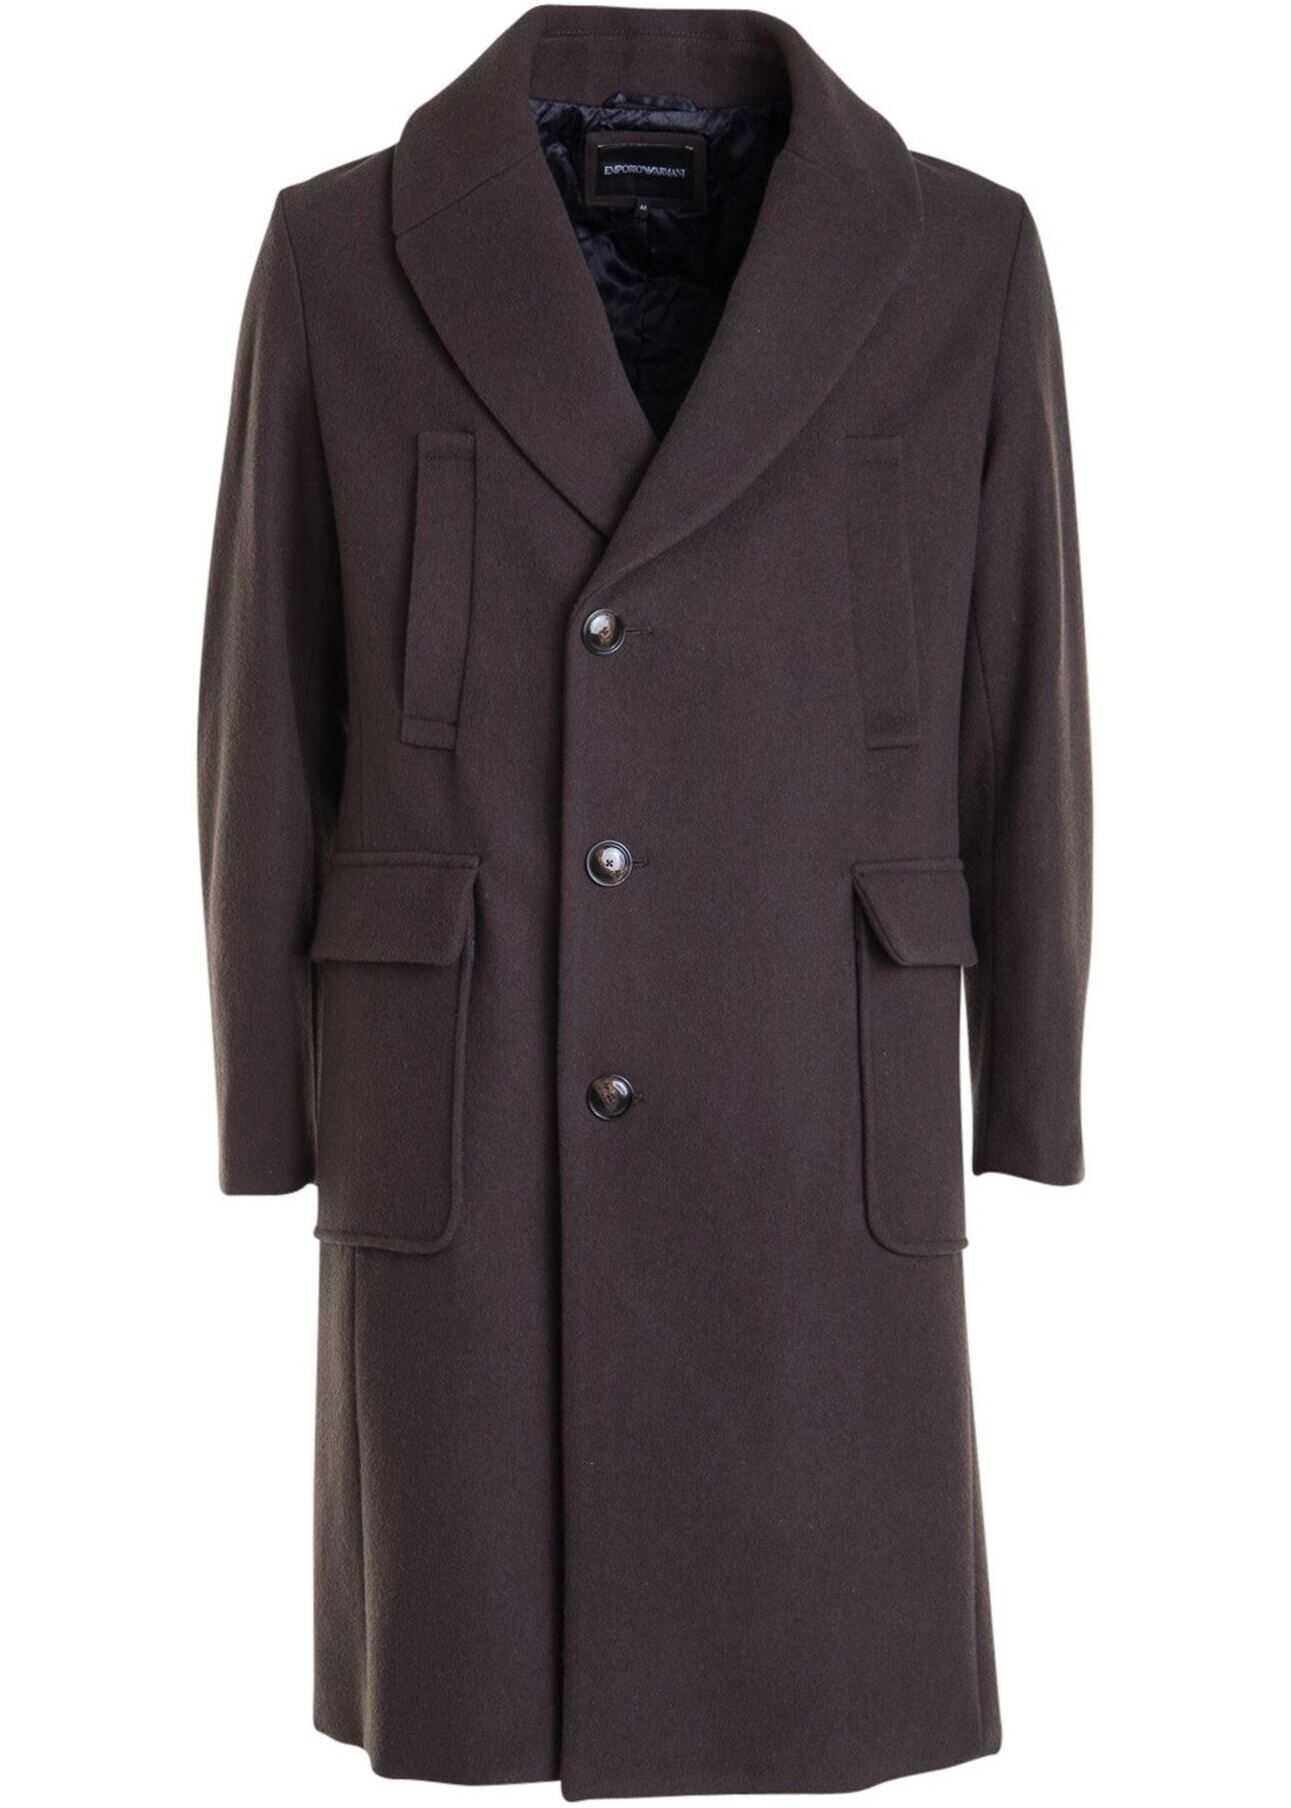 Emporio Armani Wool Cloth Knee Length Coat In Brown Brown imagine